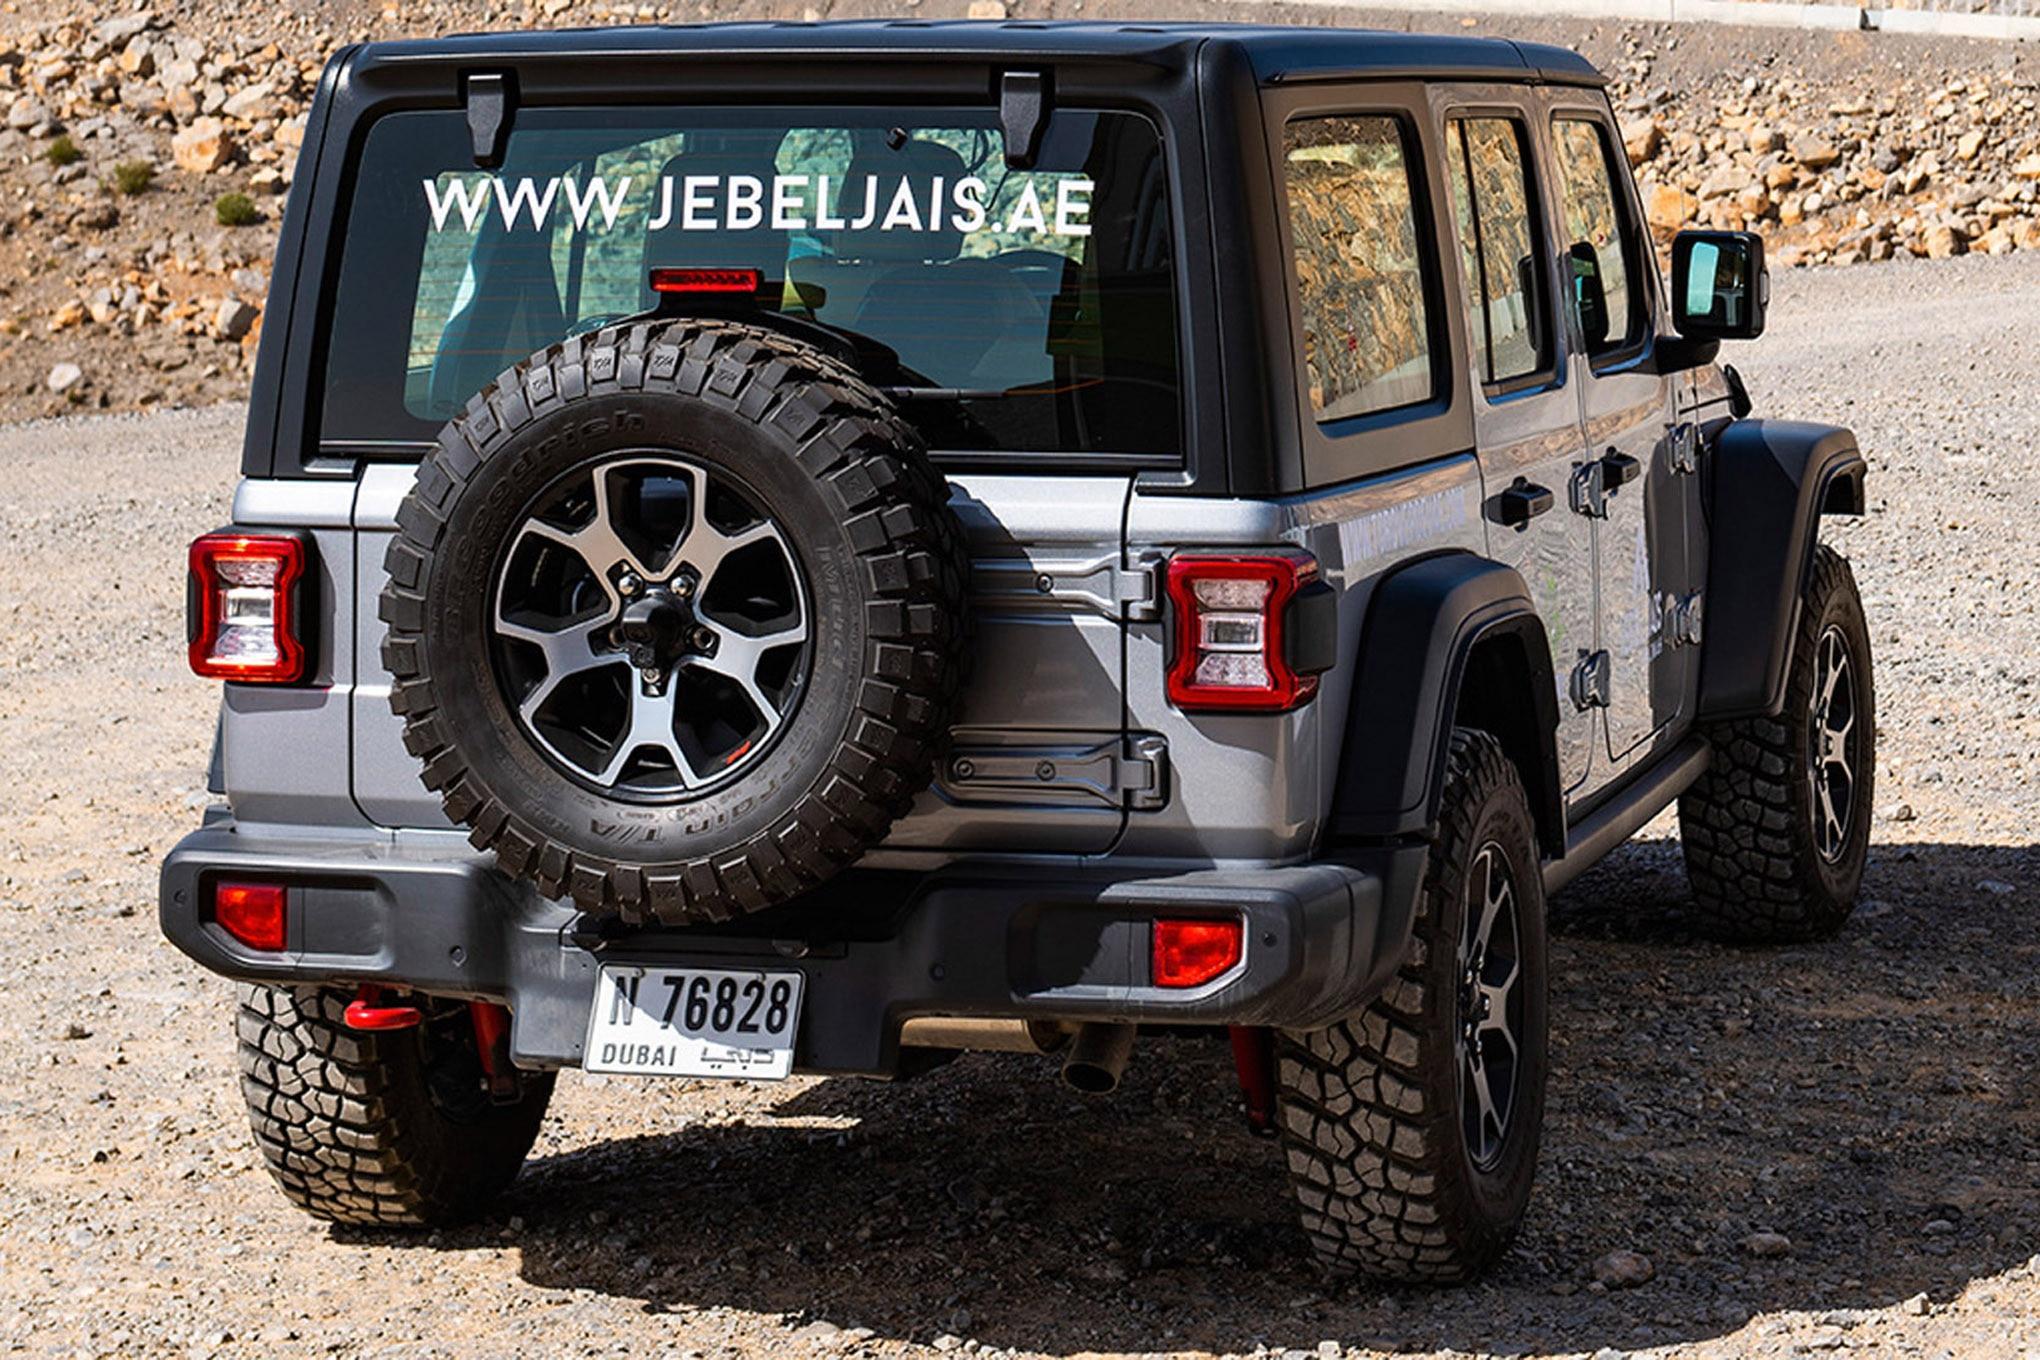 005 auto news jp jeep worlds longest zipline arb sponsorship